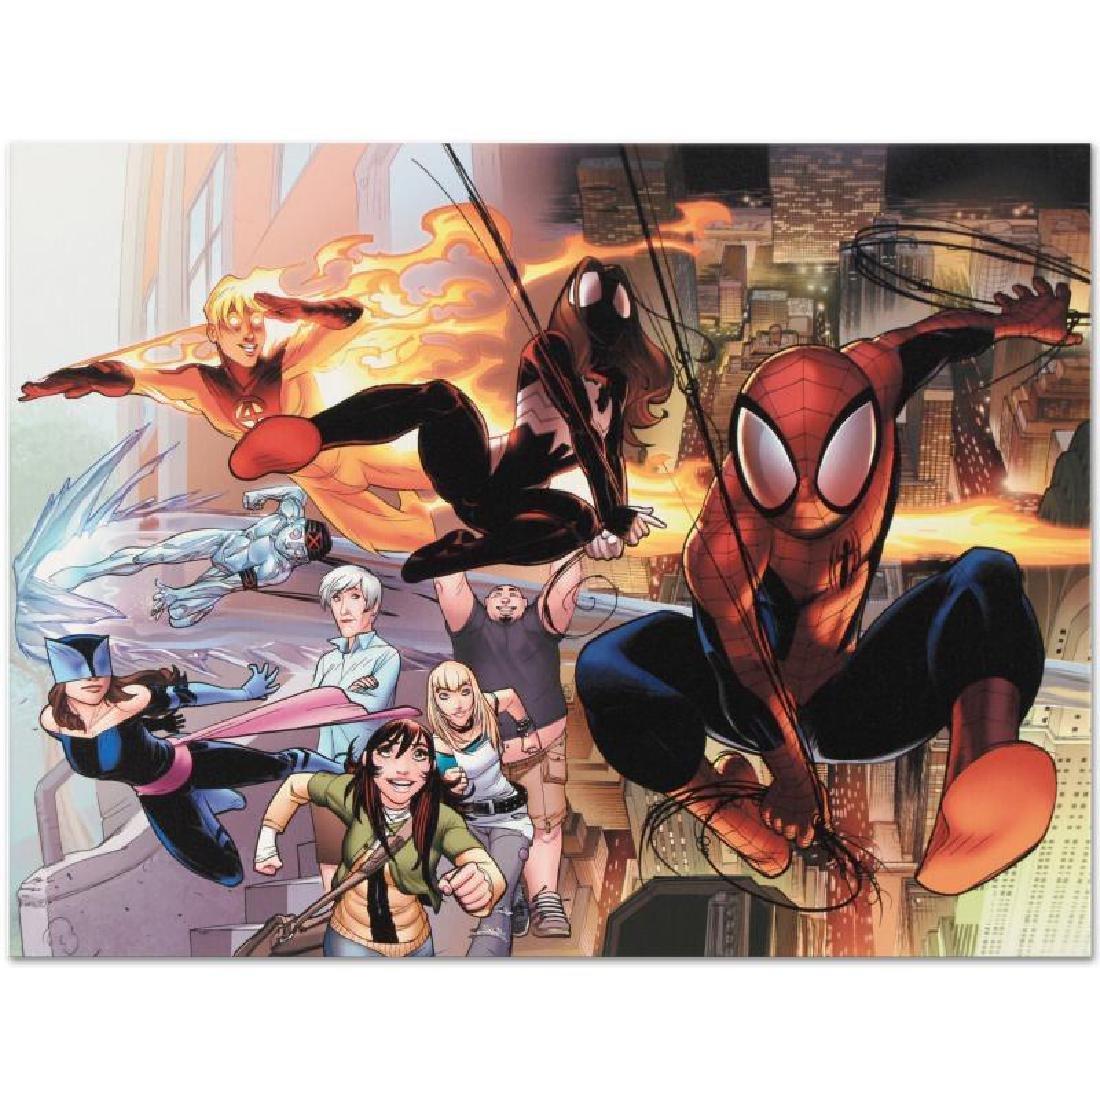 Ultimate Comics: Spider-Man #1 by Marvel Comics